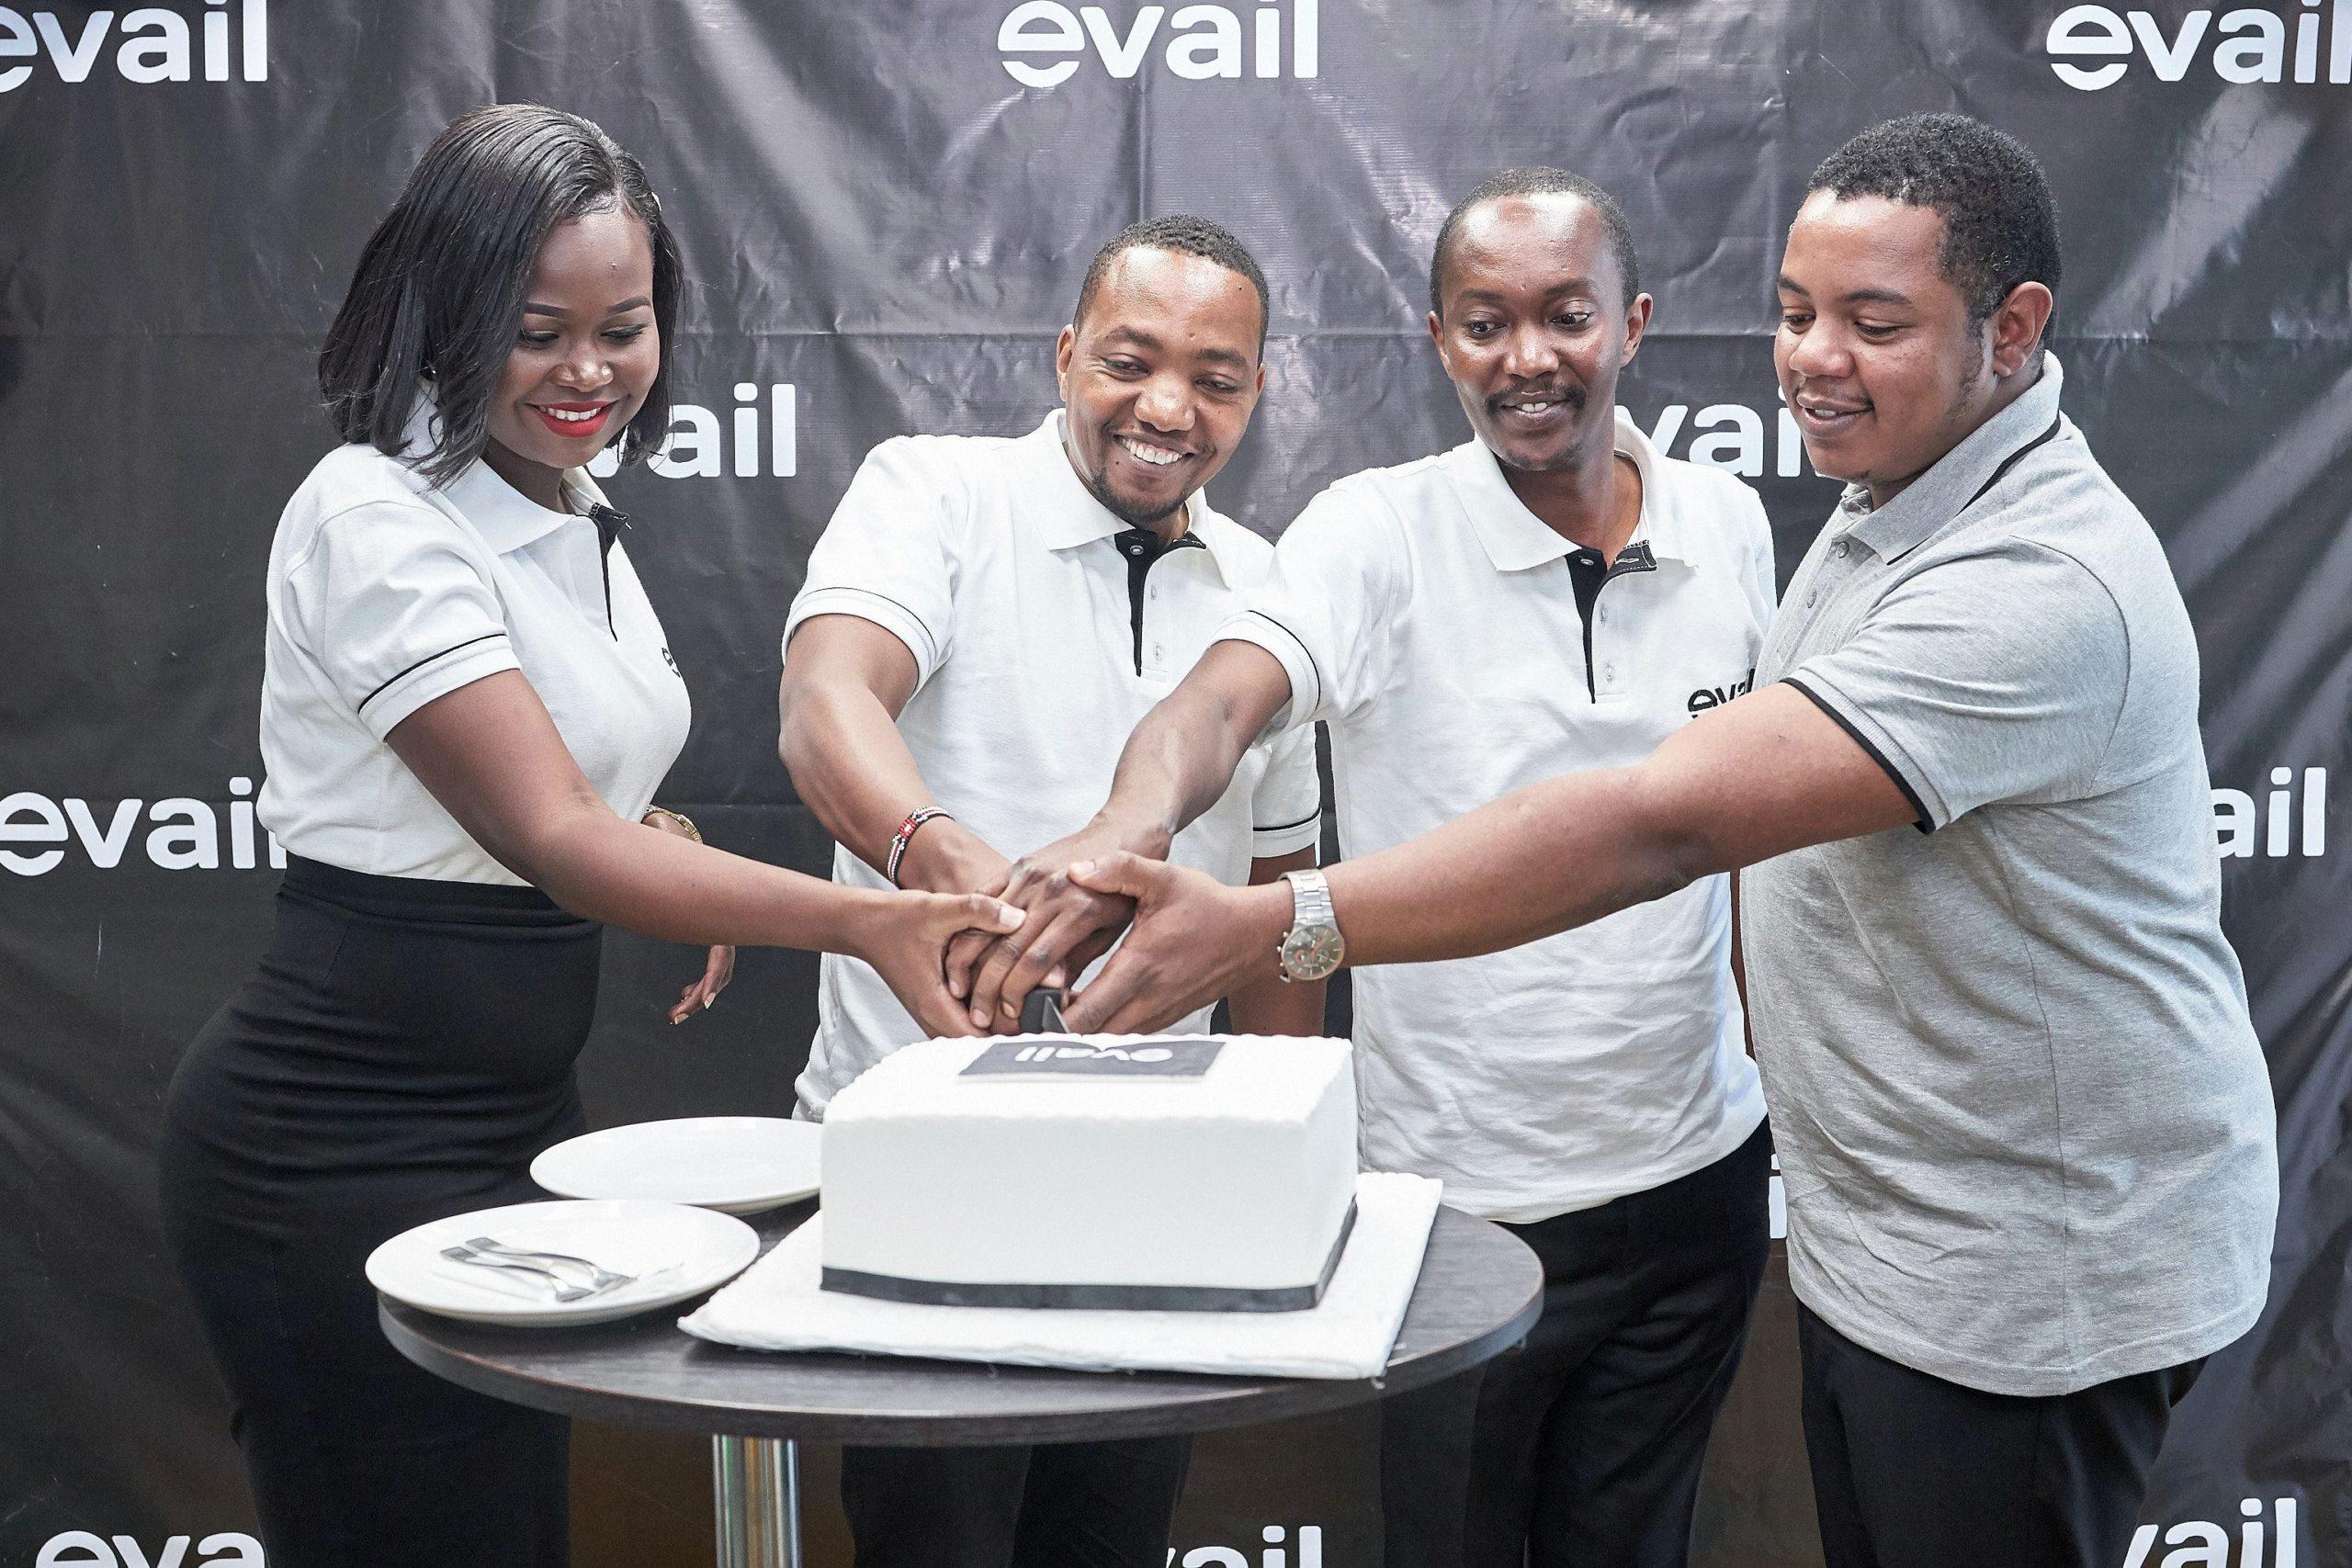 Kenya Compfix Data Limited Rebrands to Evail